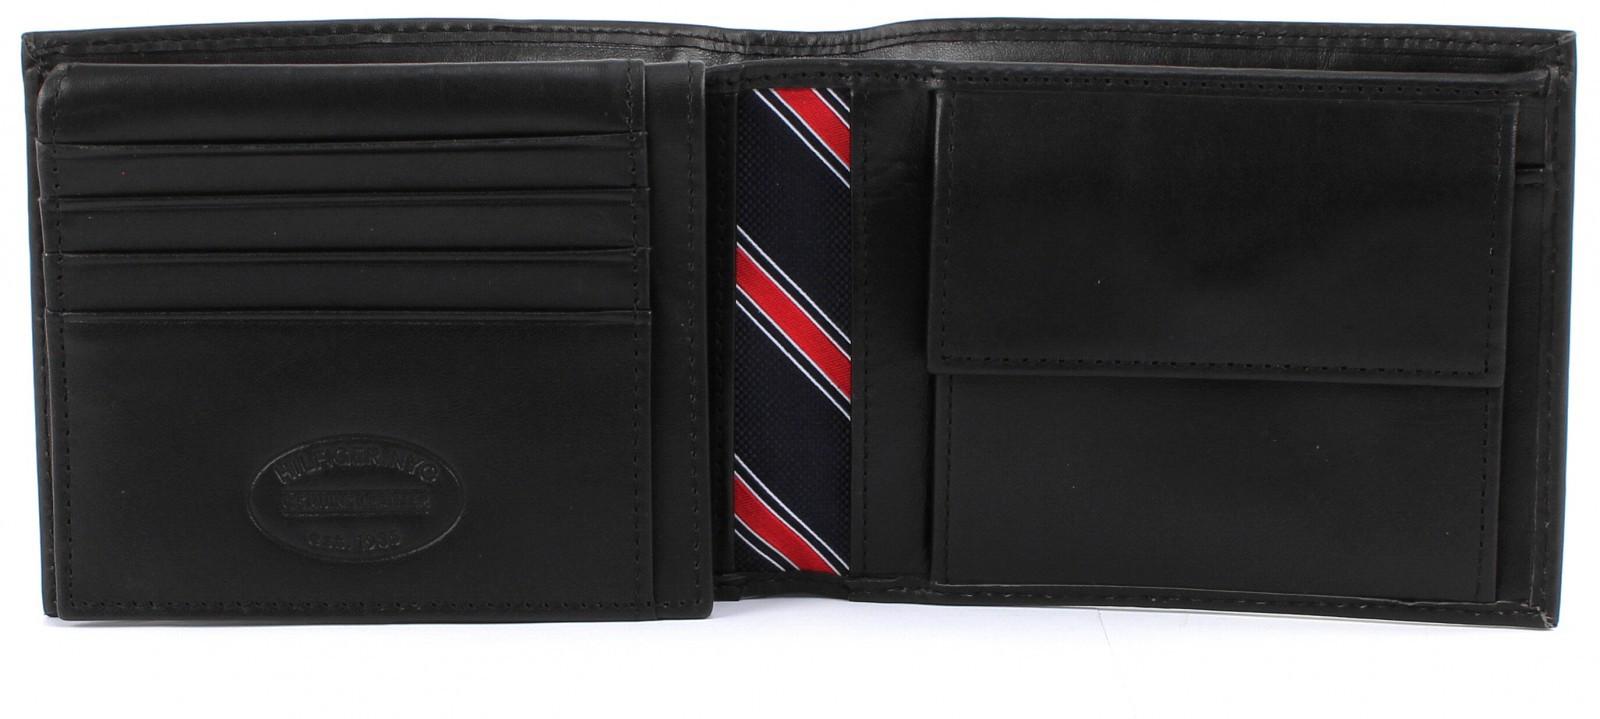 TOMMY HILFIGER Eton CC Flap and Coin Pocket Black